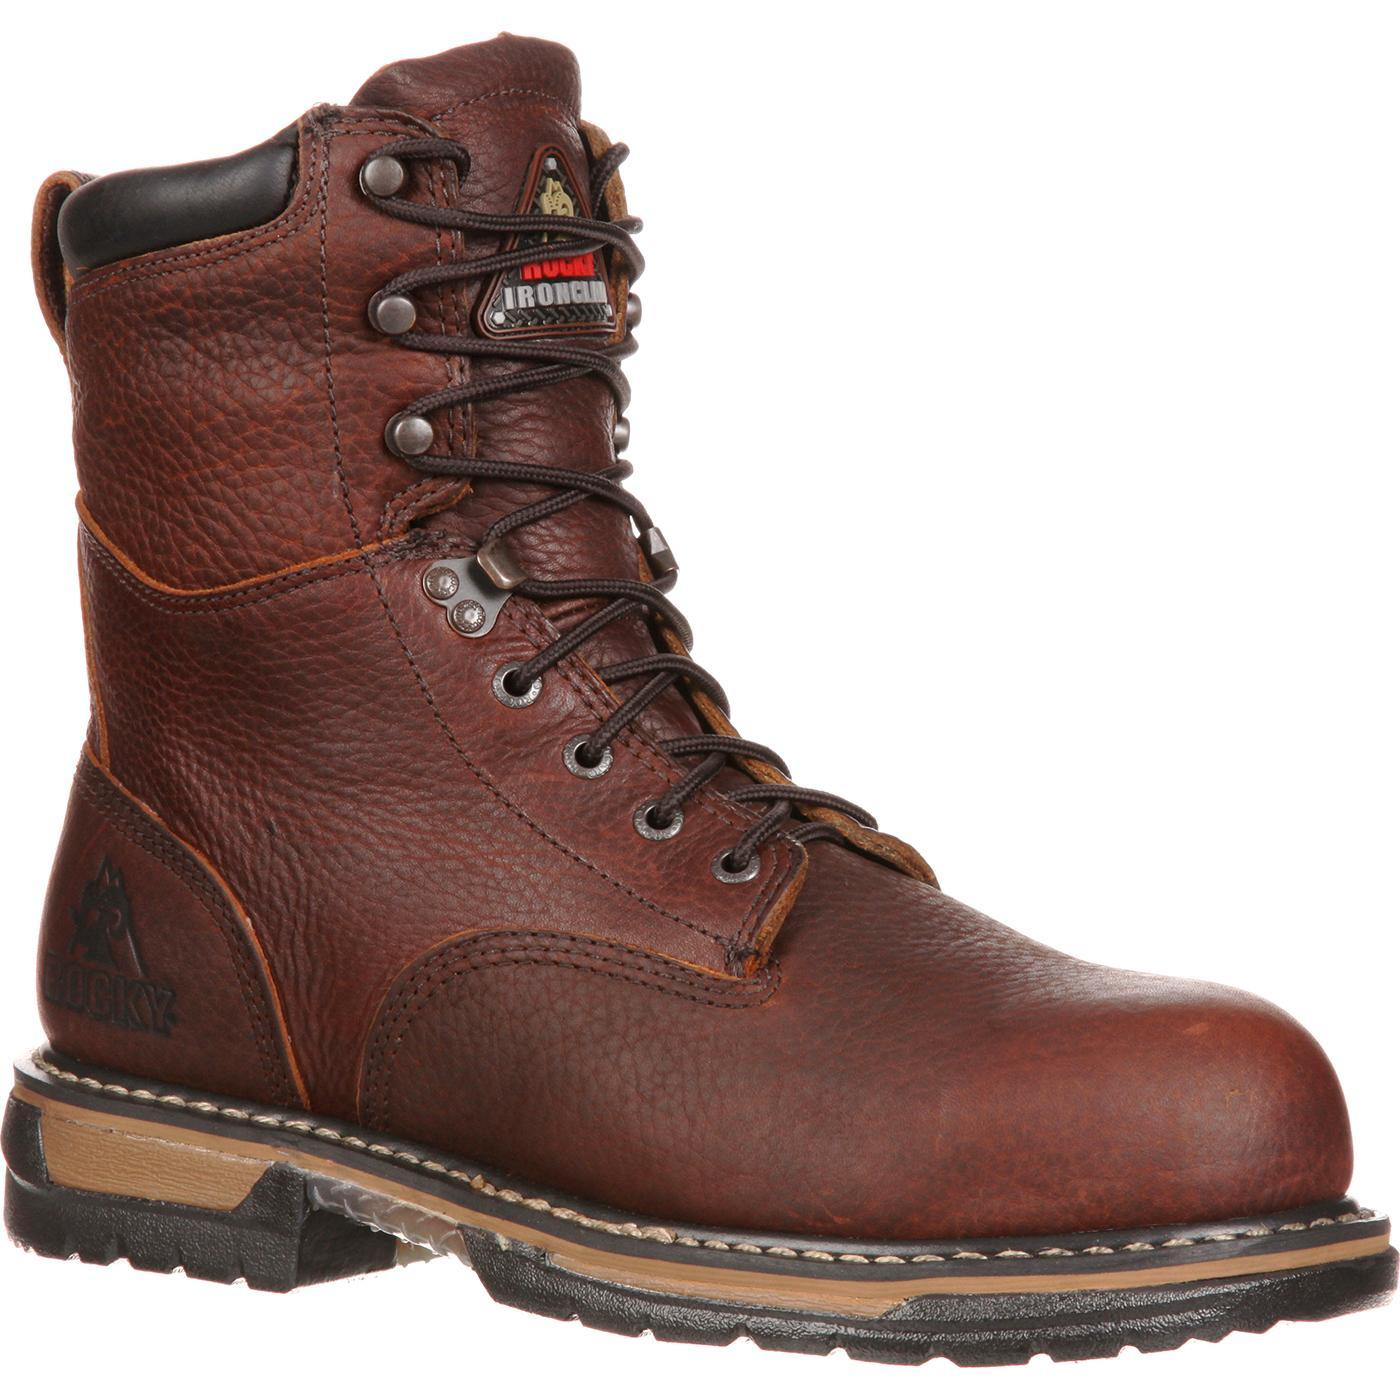 Rocky Ironclad Comfortable Waterproof Work Boot Fq0005693